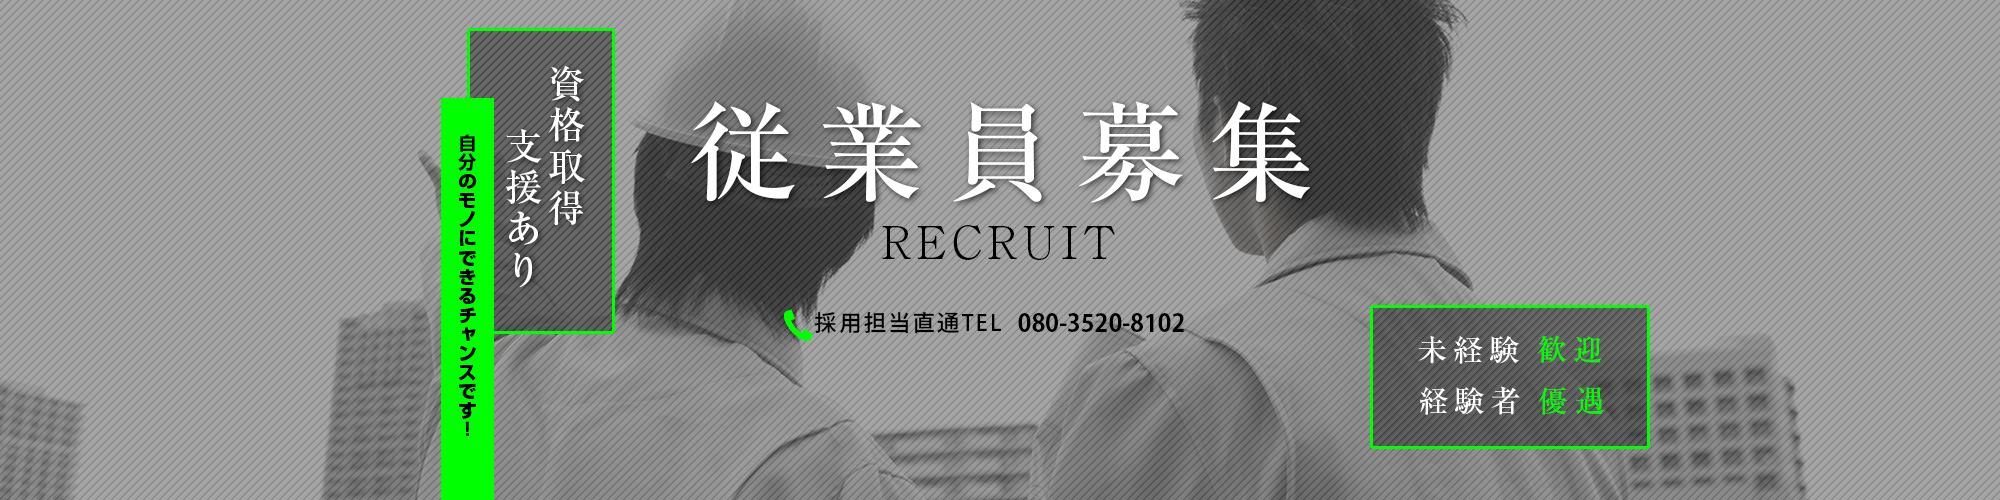 0:banner_recruit